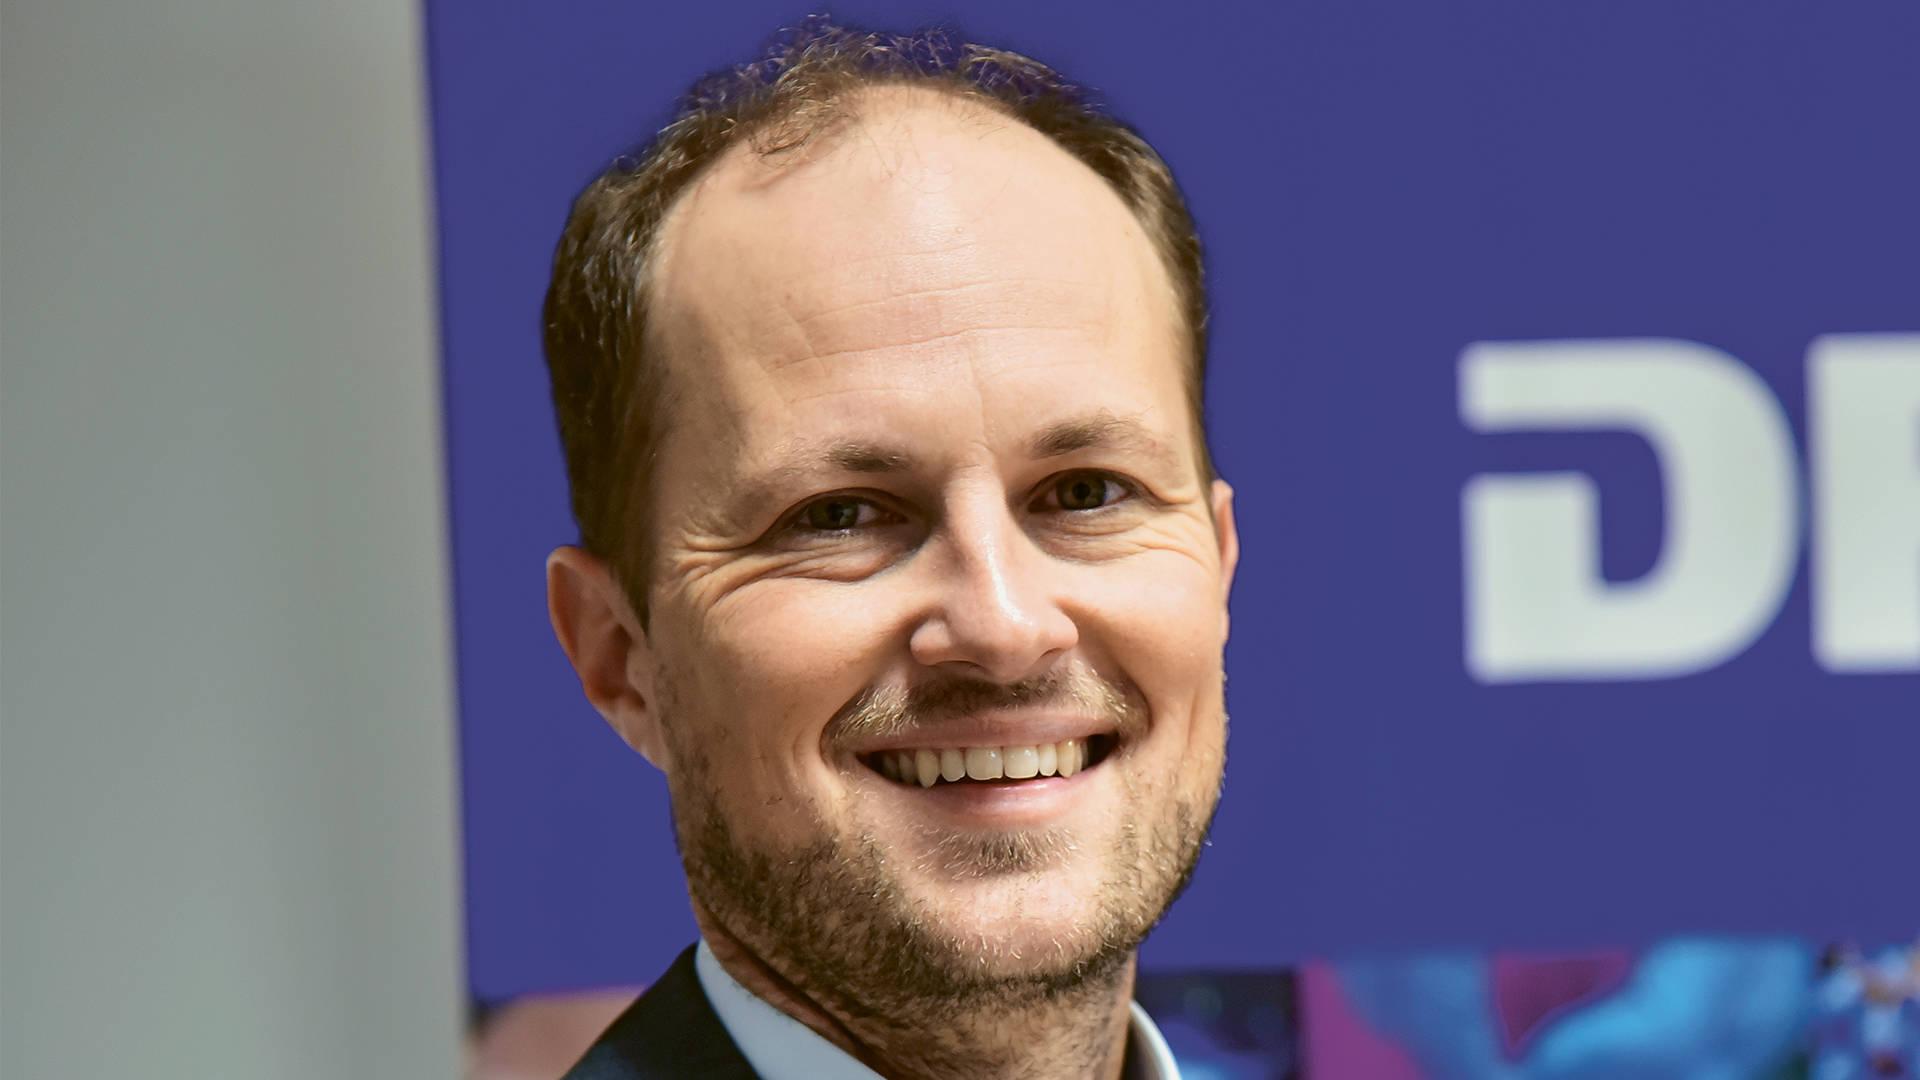 Dr Matthias Kiesselbach, Chairman of the Advisory Board of the DWIH New Delhi